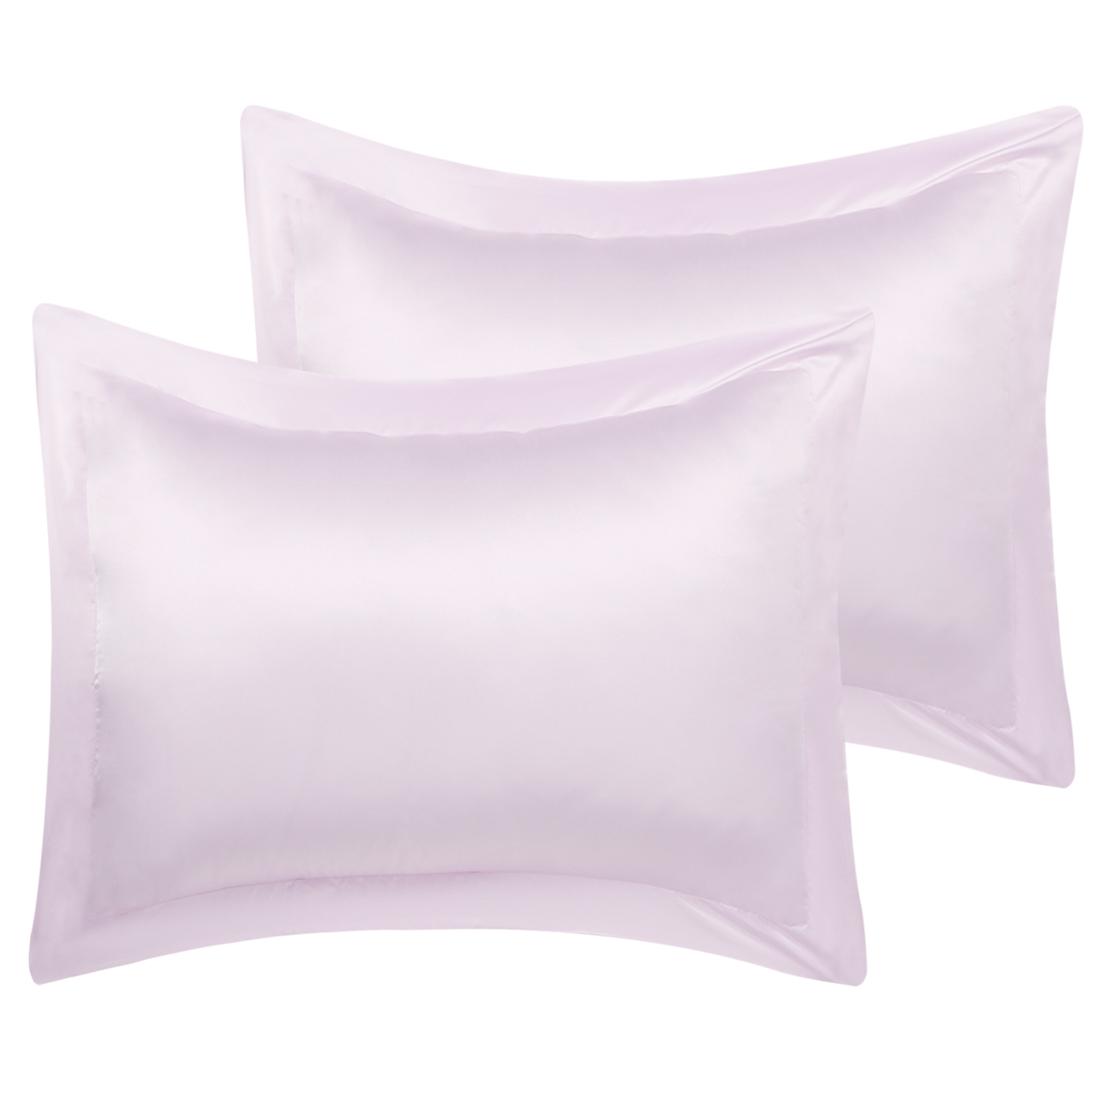 2 Pcs Lavender Gray Pillow Shams Satin Pillow Cases Queen Oxford Pillowcases